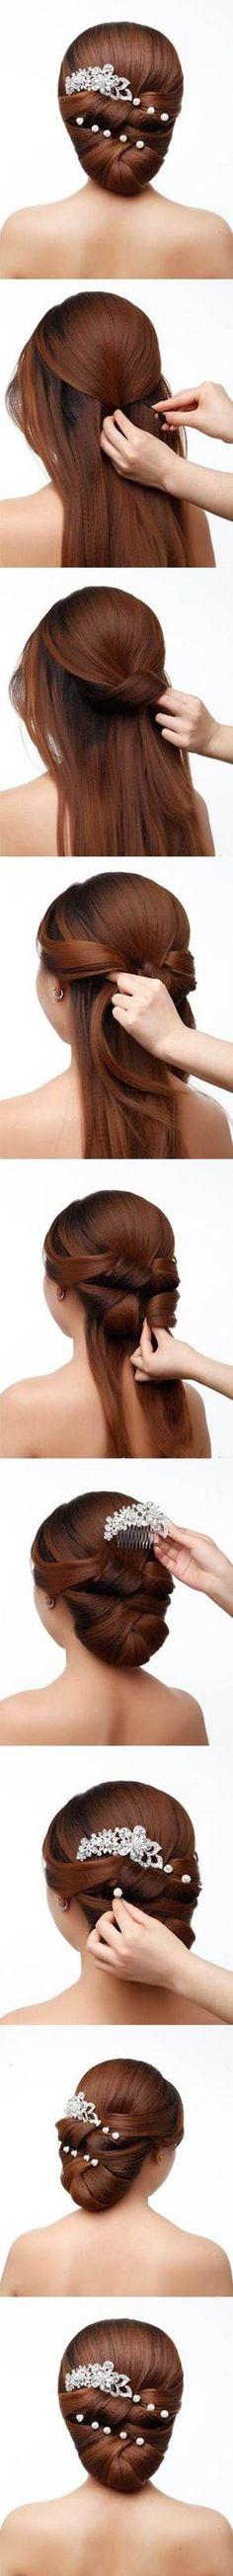 DIY Elegant Bridal Hairstyle 2: